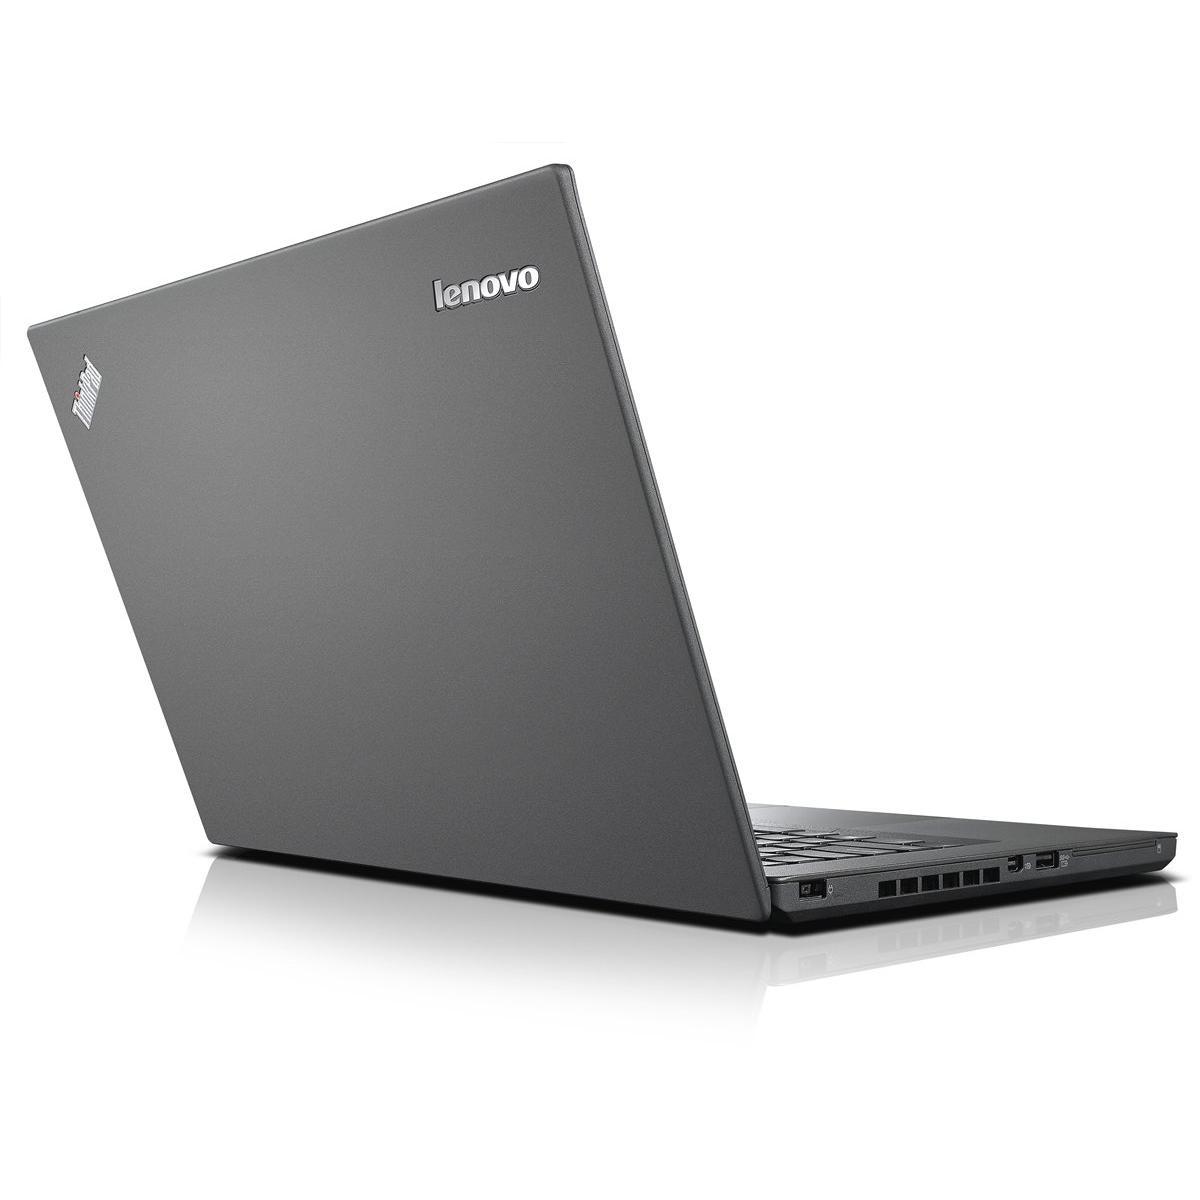 "Lenovo ThinkPad T440 14"" (2014) - Core i5-4300M - 4GB - SSD 128 GB AZERTY - Francúzska"